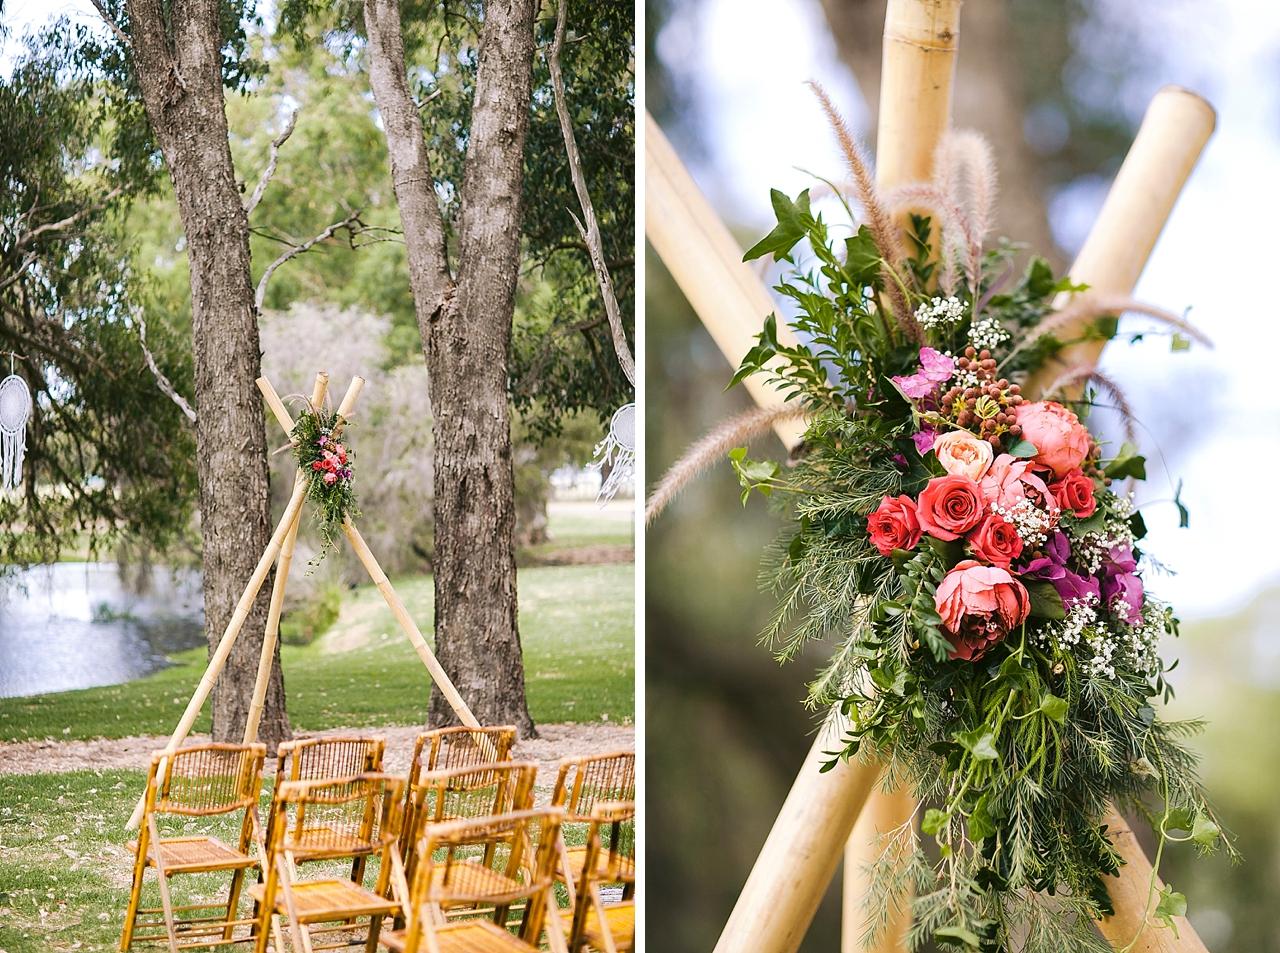 Perth Backyard Wedding0002.jpg